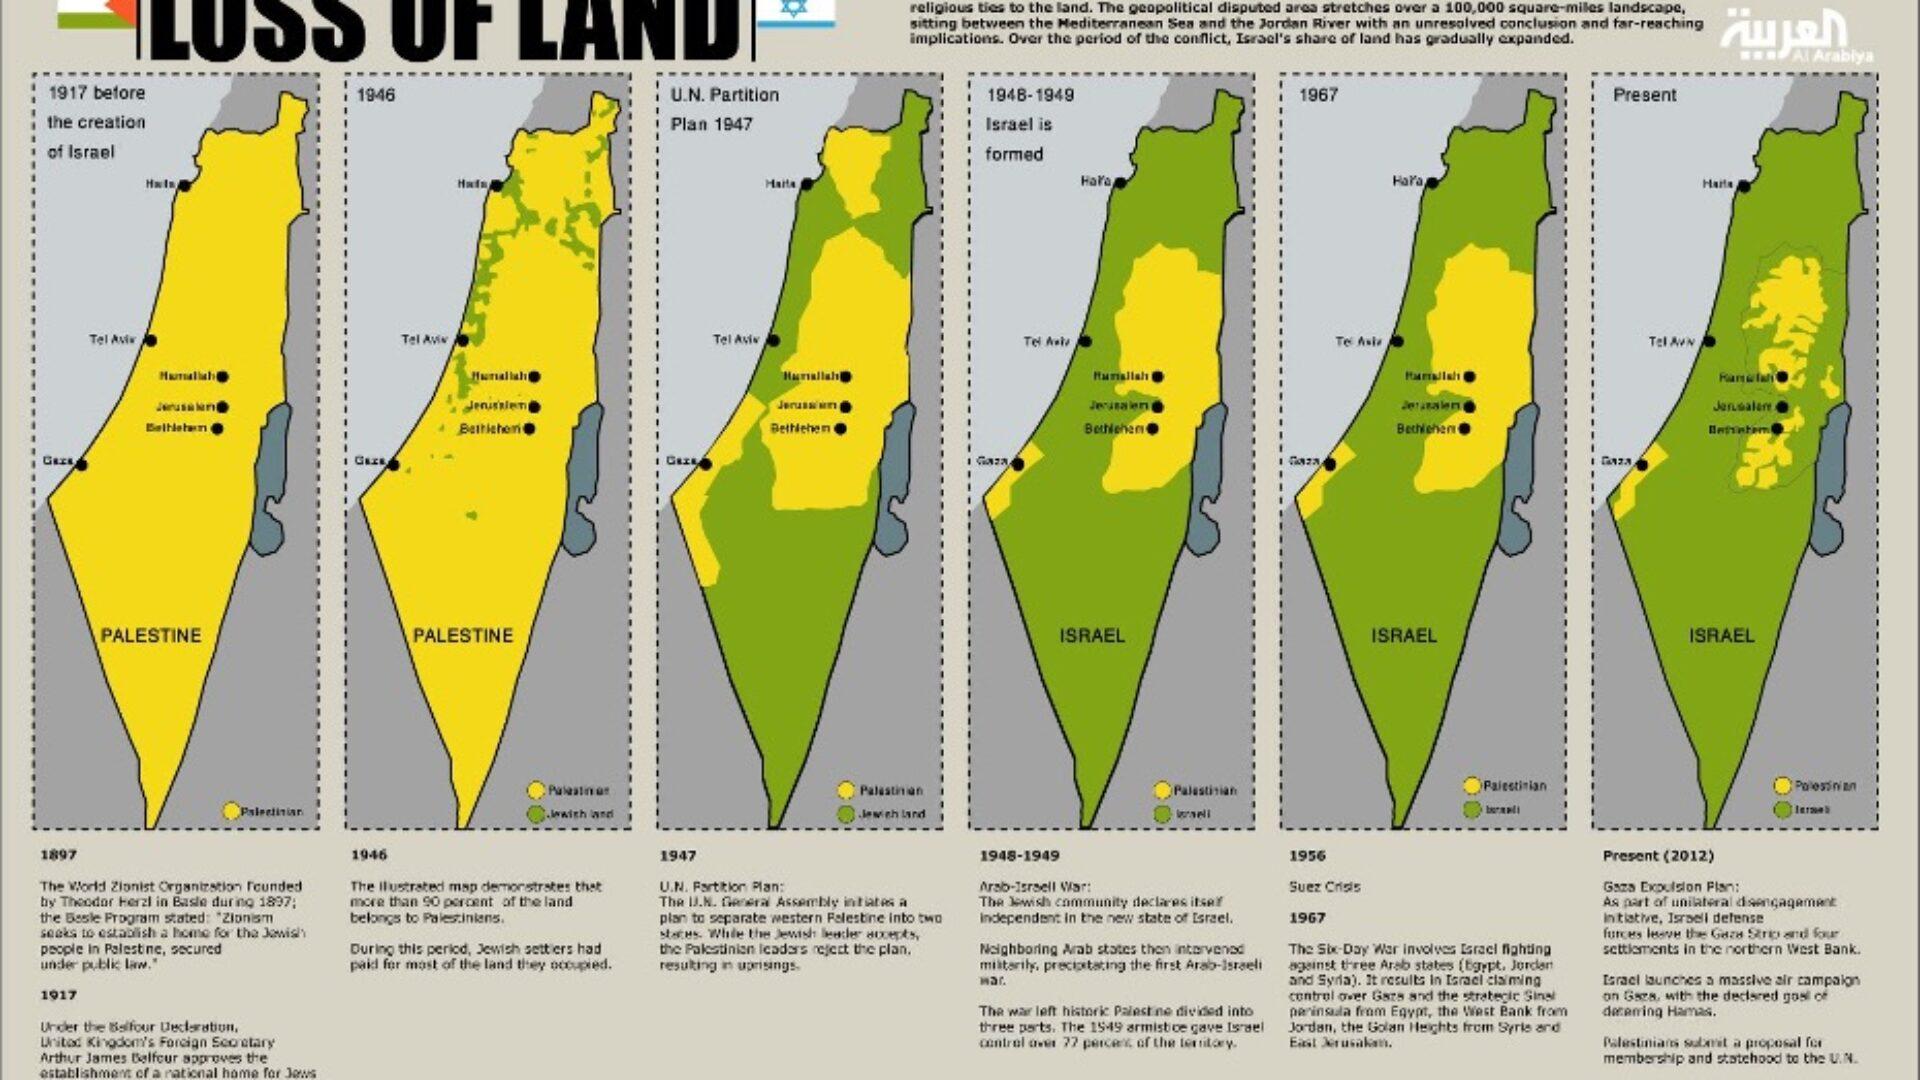 Maps of diminishing Palestinian territory in Gaza